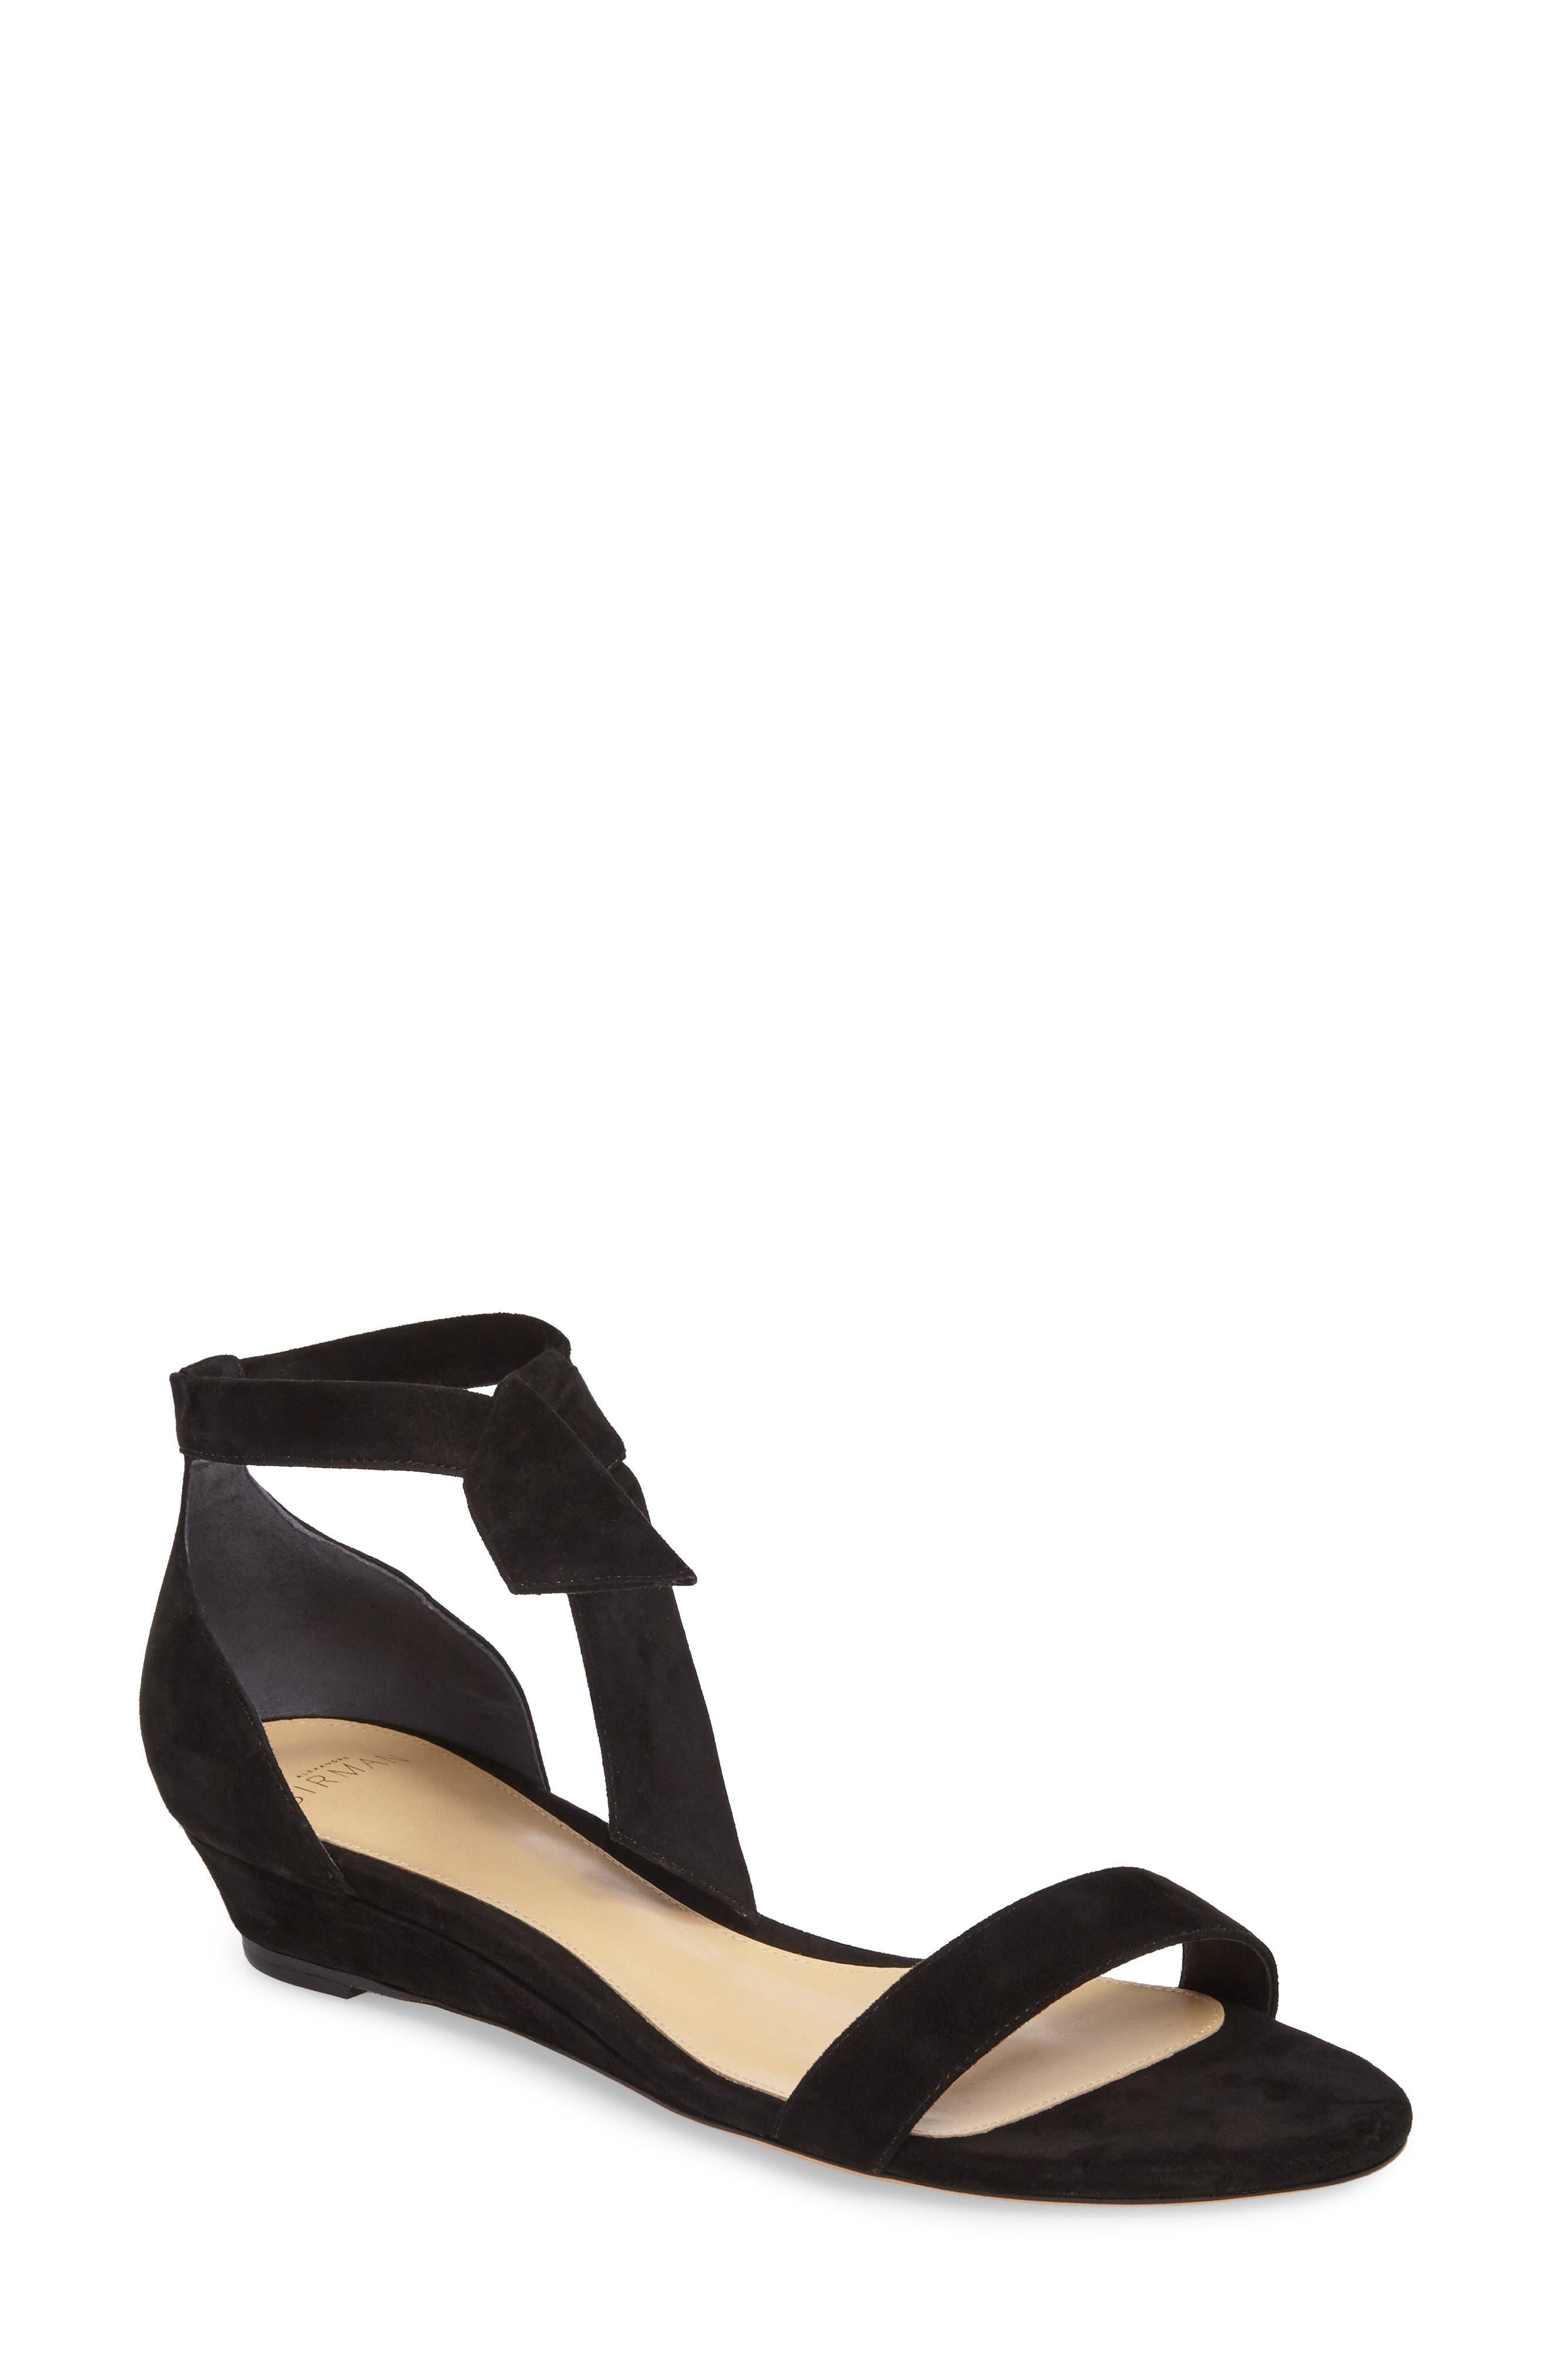 Atena Tie Strap Wedge Sandal,                         Main,                         color, 001